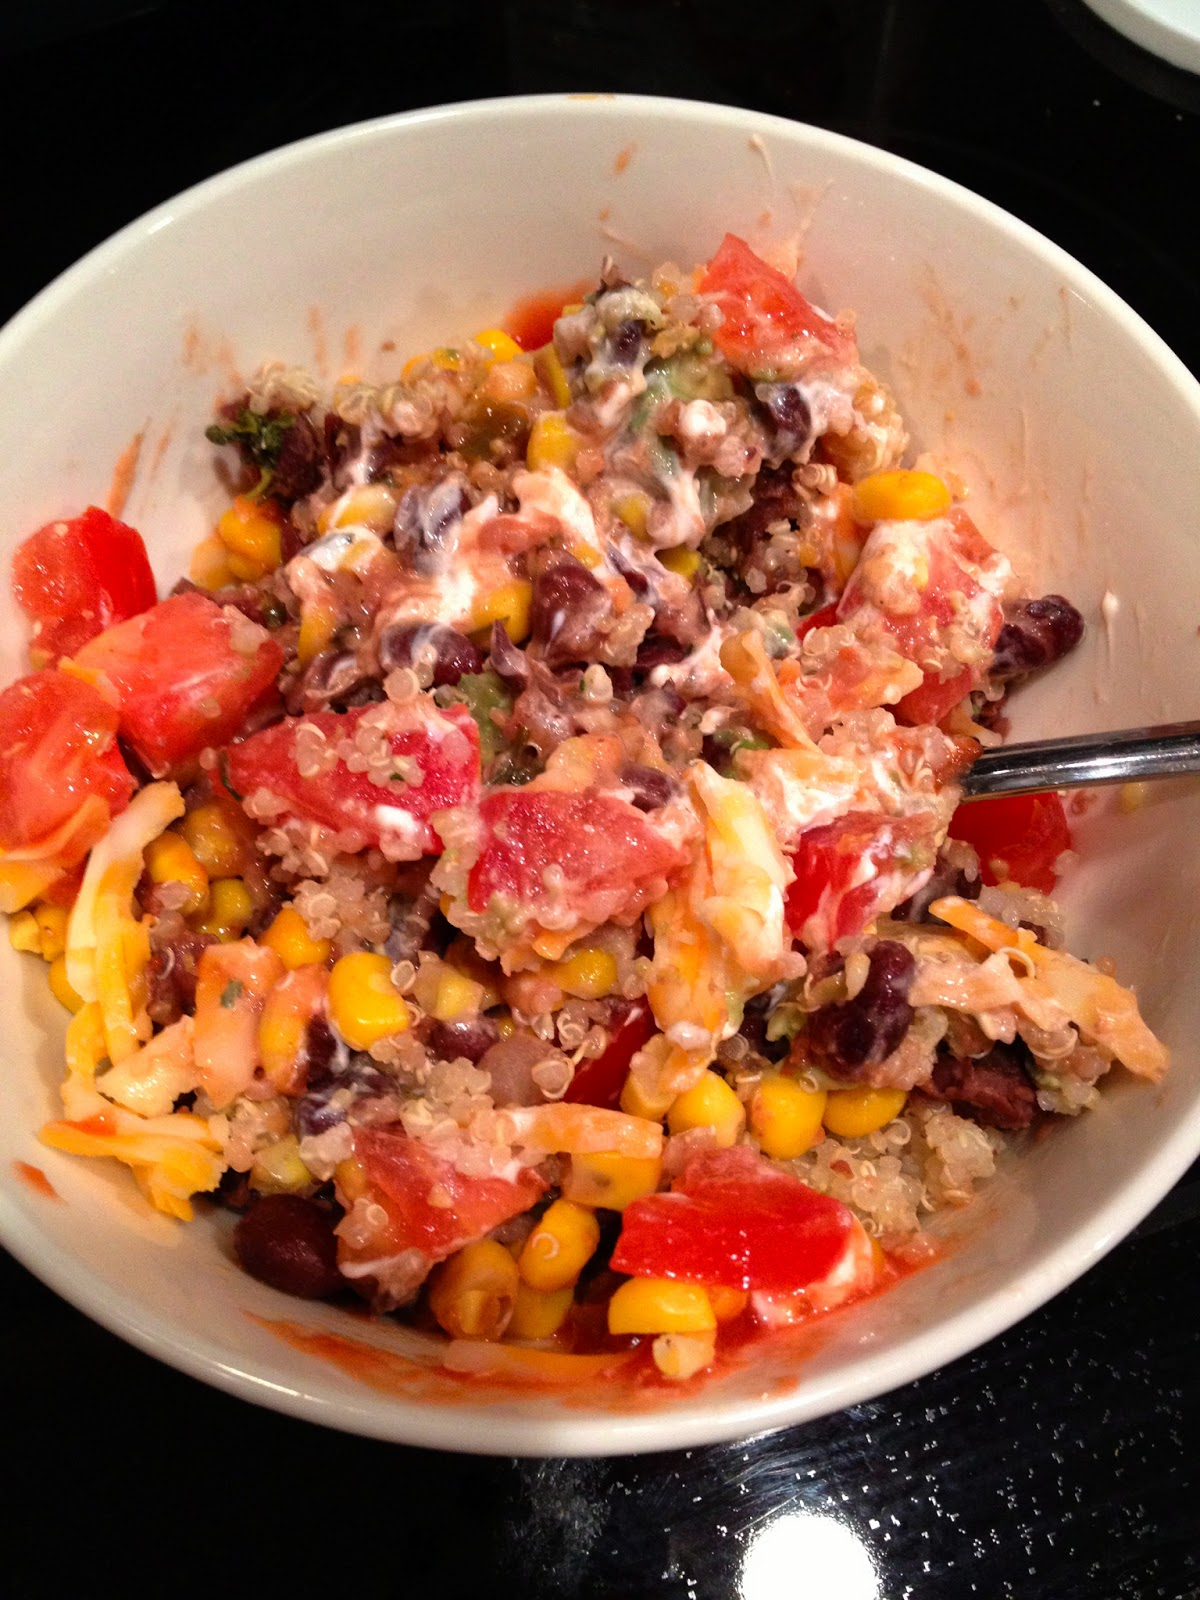 Confessions of a Health Queen: Quinoa Black Bean Burrito Bowl